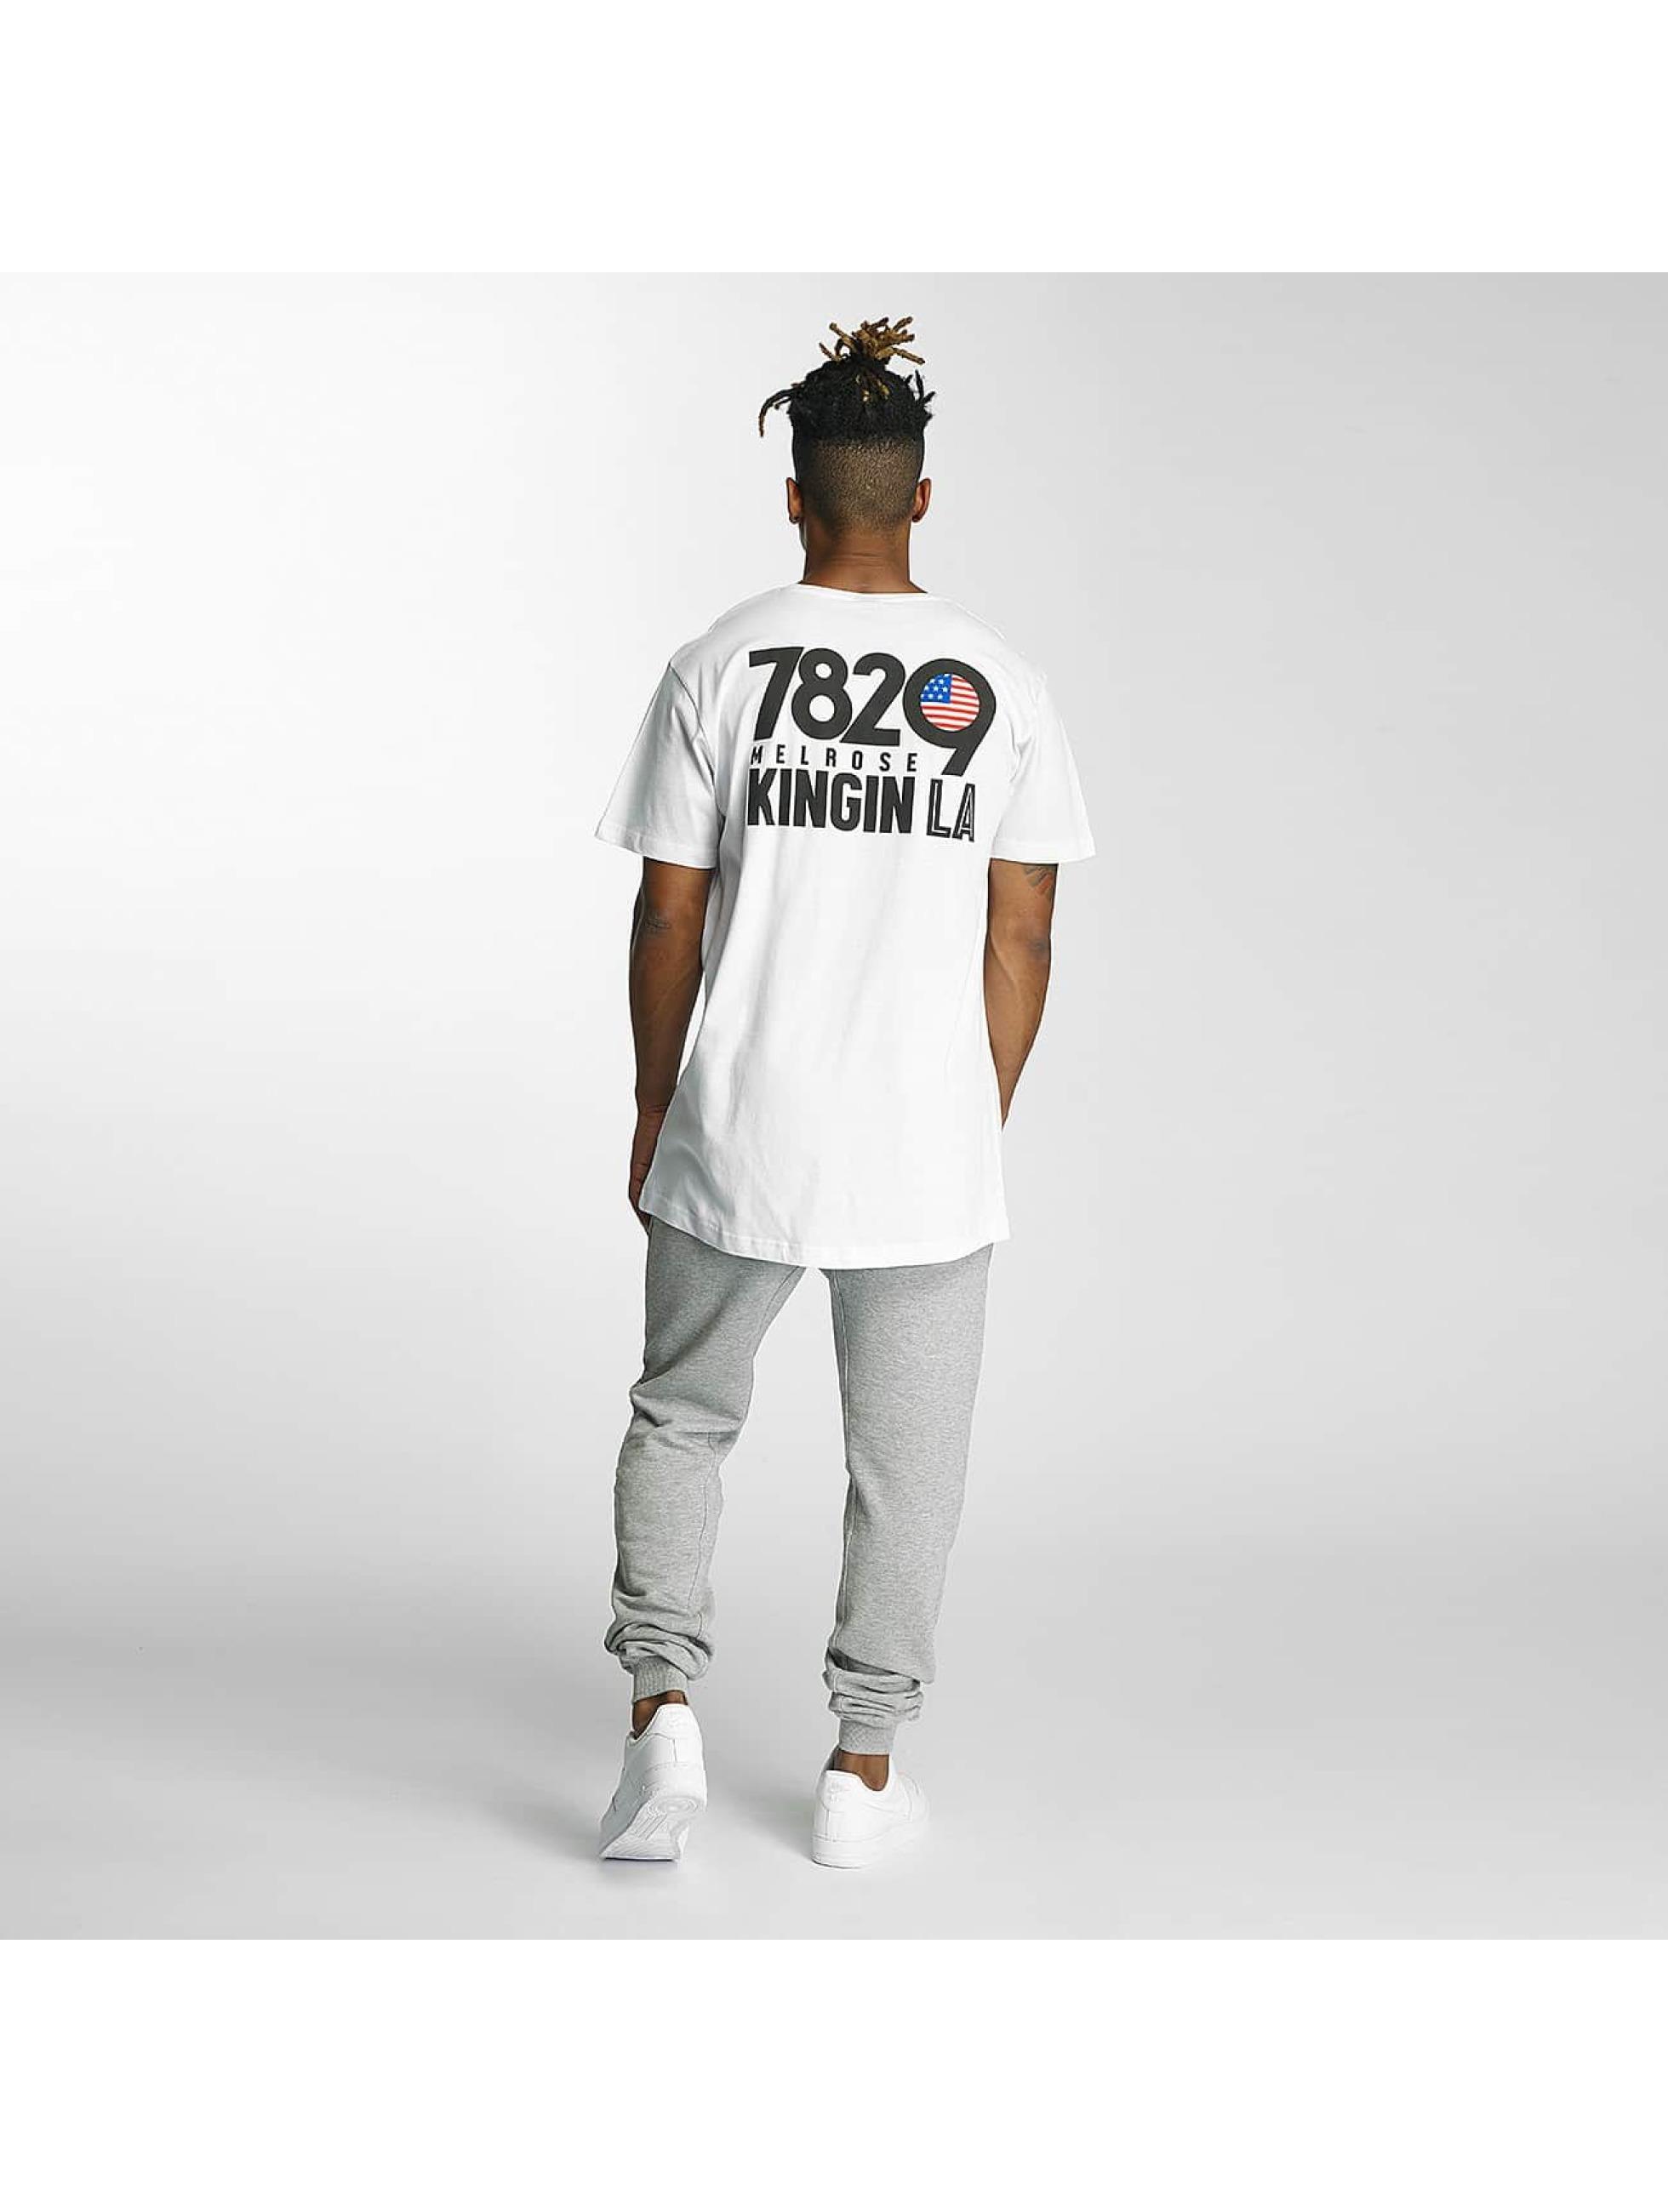 Kingin T-Shirt Melrose white